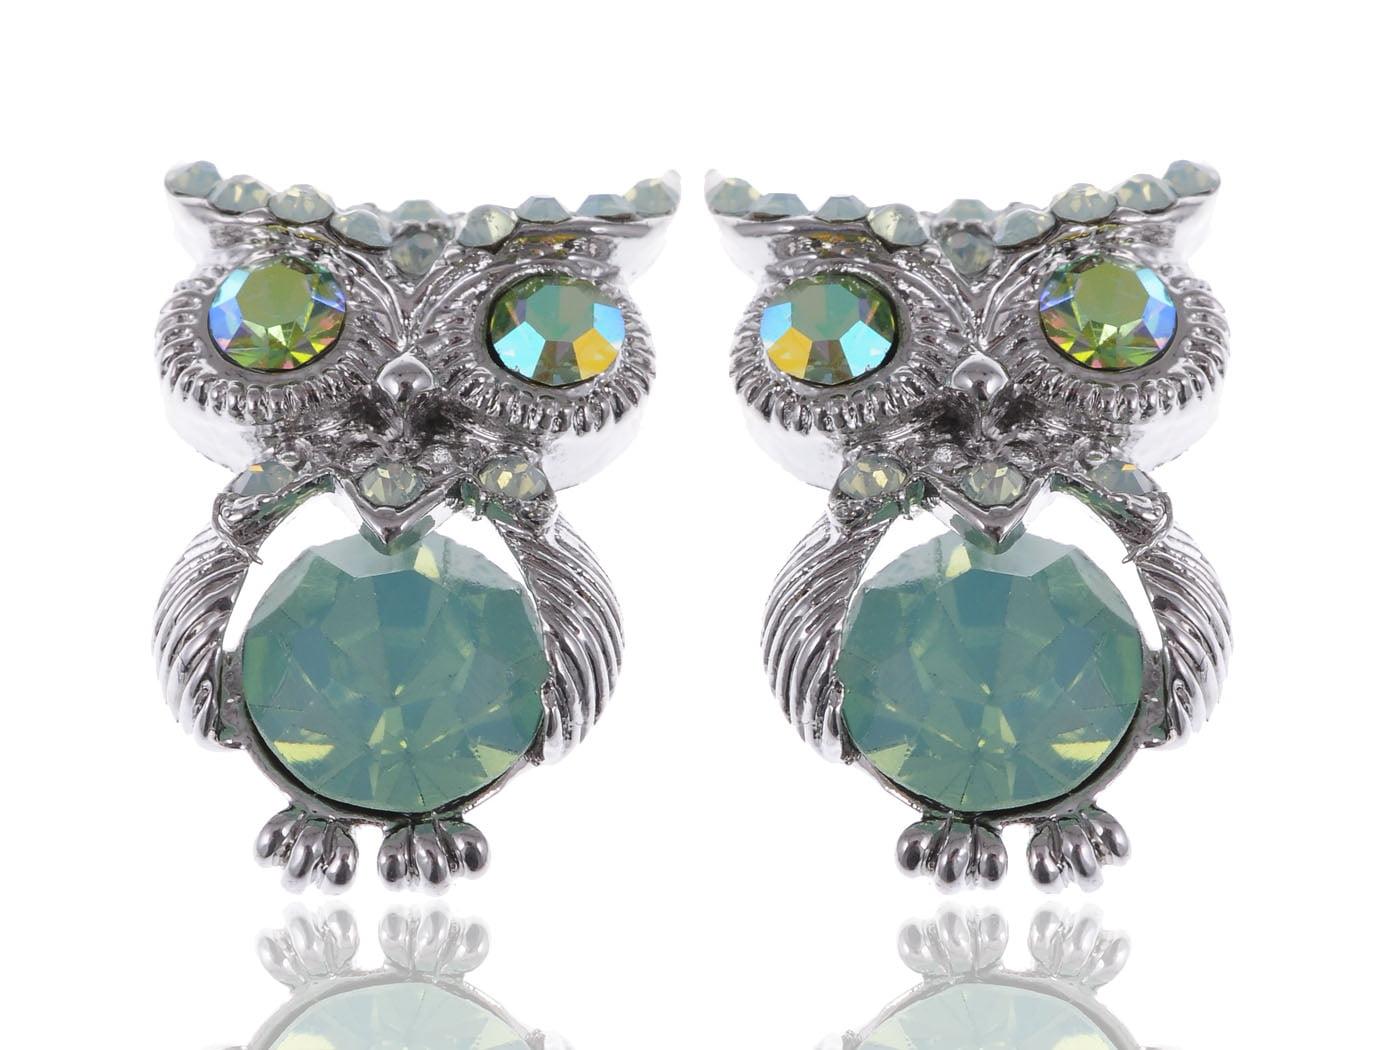 Silvertone Mini Pacific Opal Rhinestone Green Bodied Owl Fashion Button Earrings by